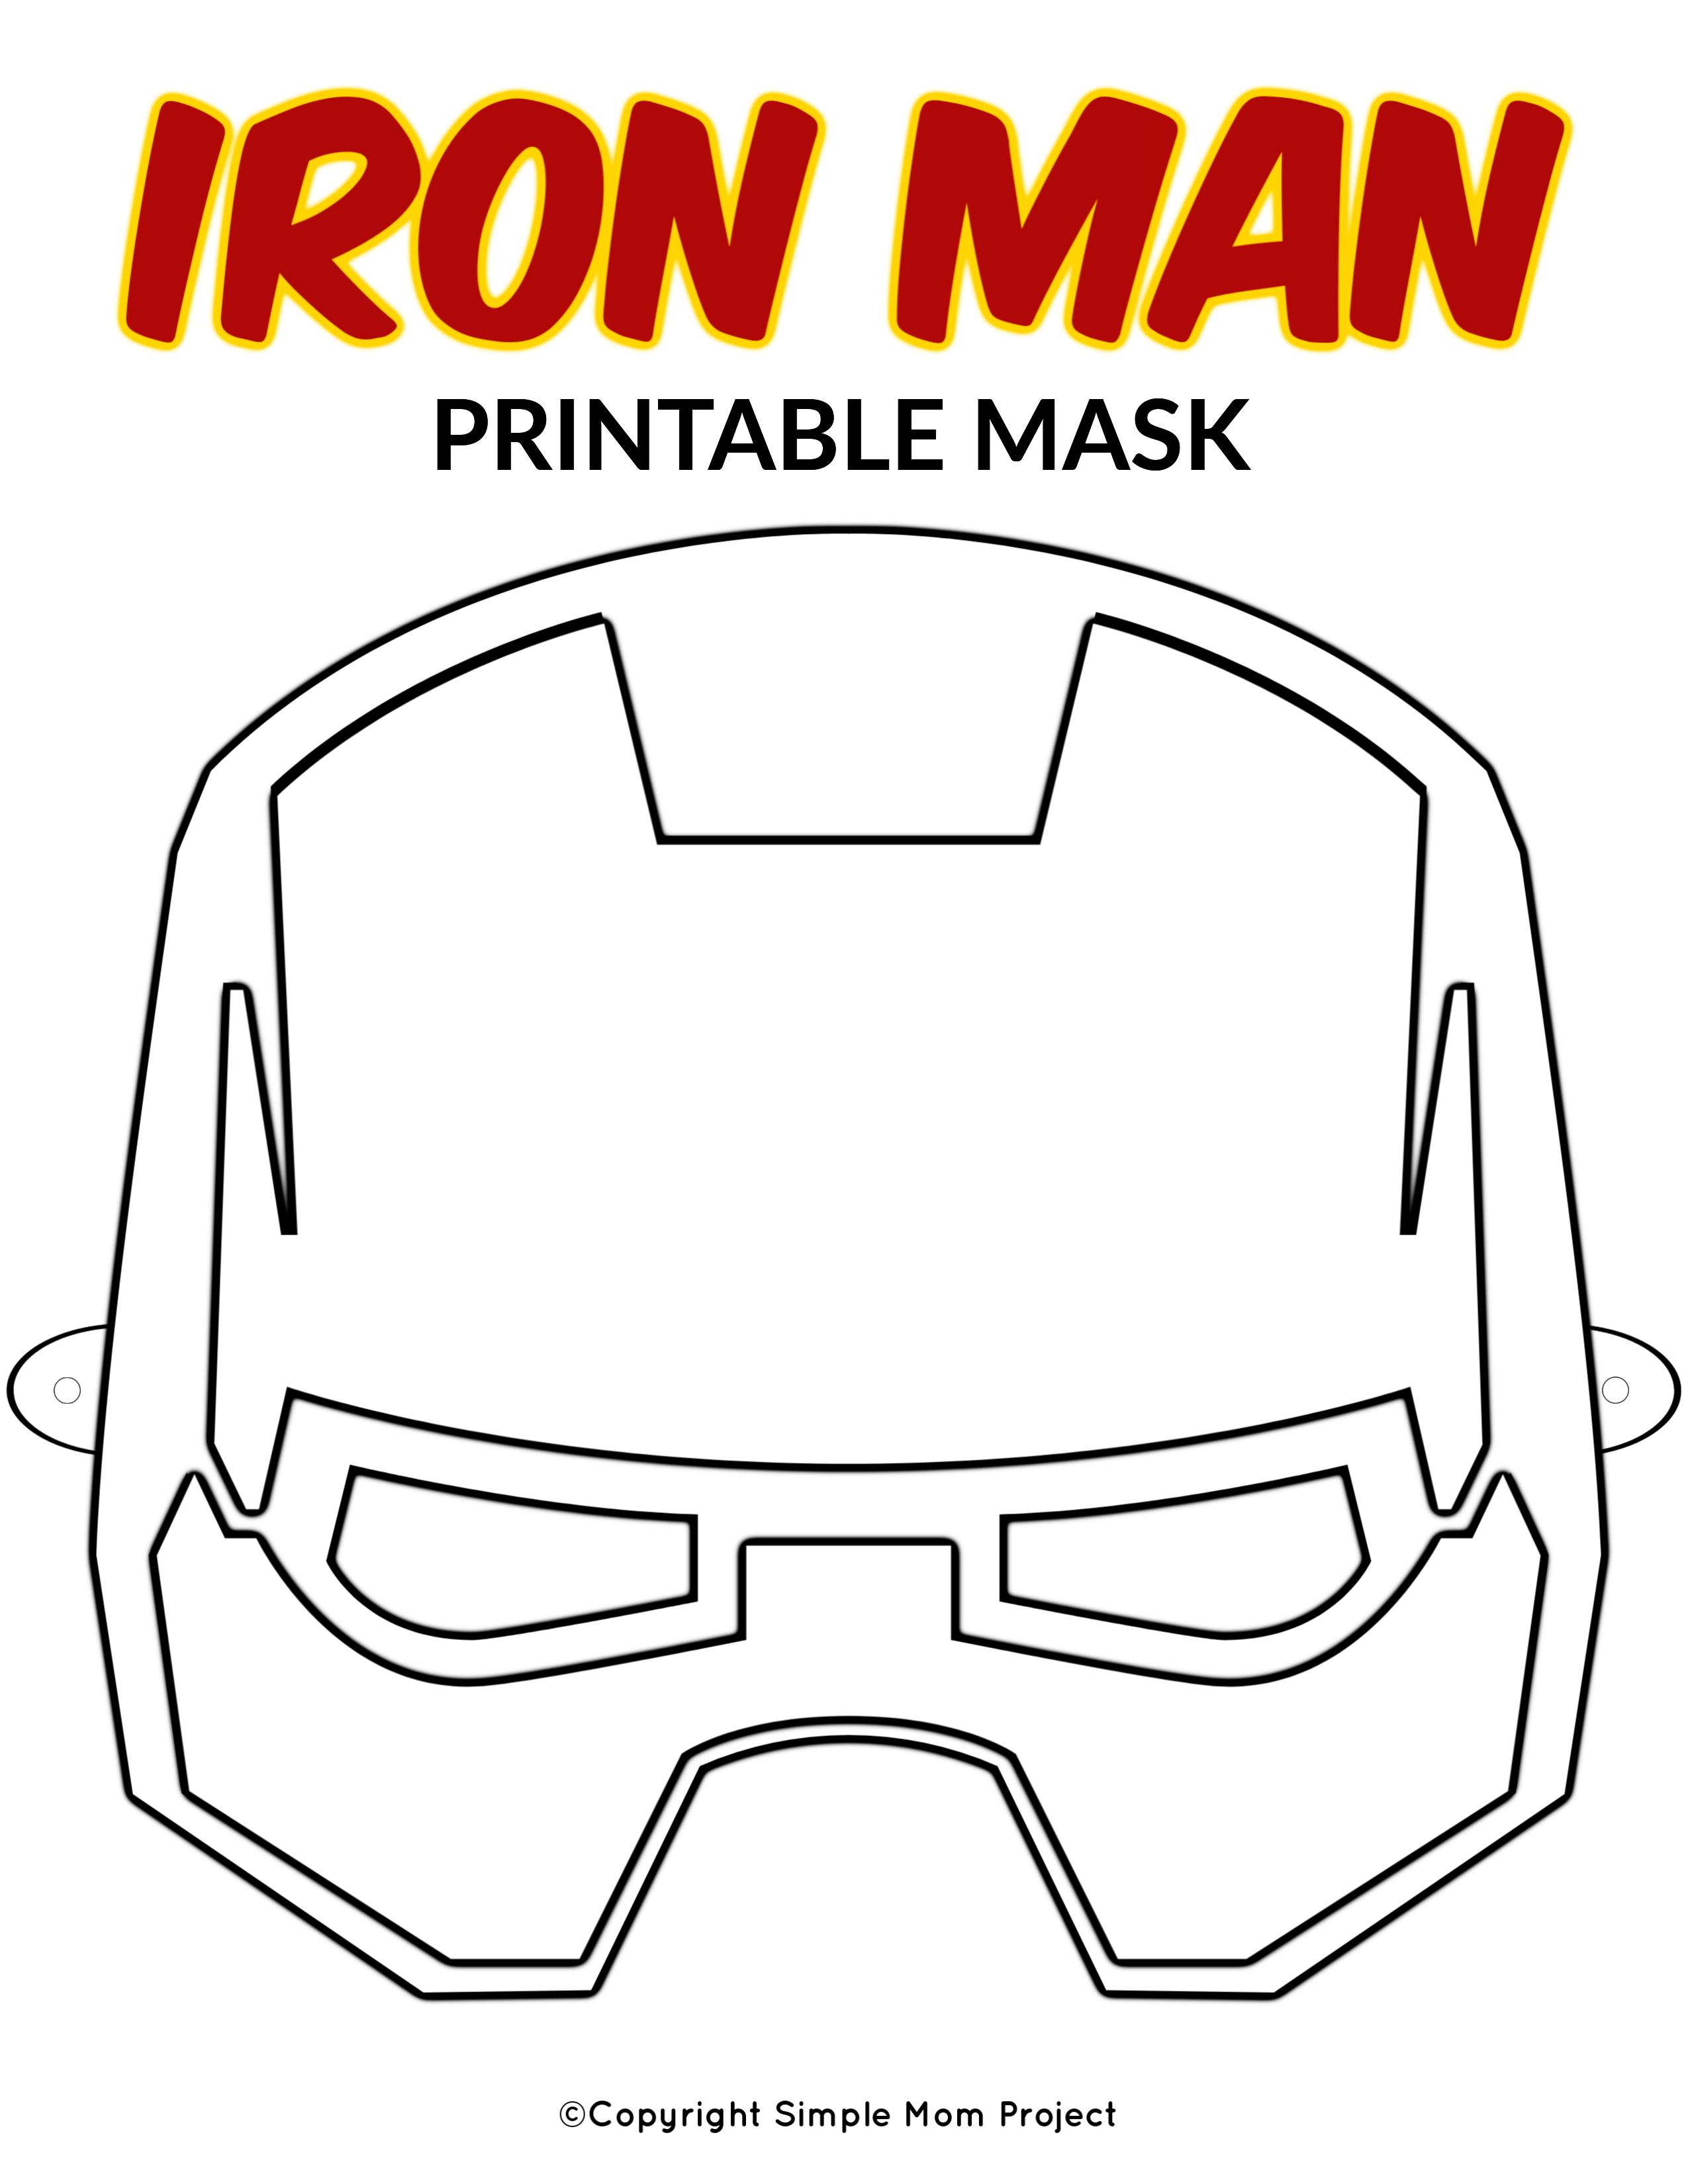 Free Printable Superhero Face Masks For Kids - Simple Mom Project - Free Printable Ironman Mask